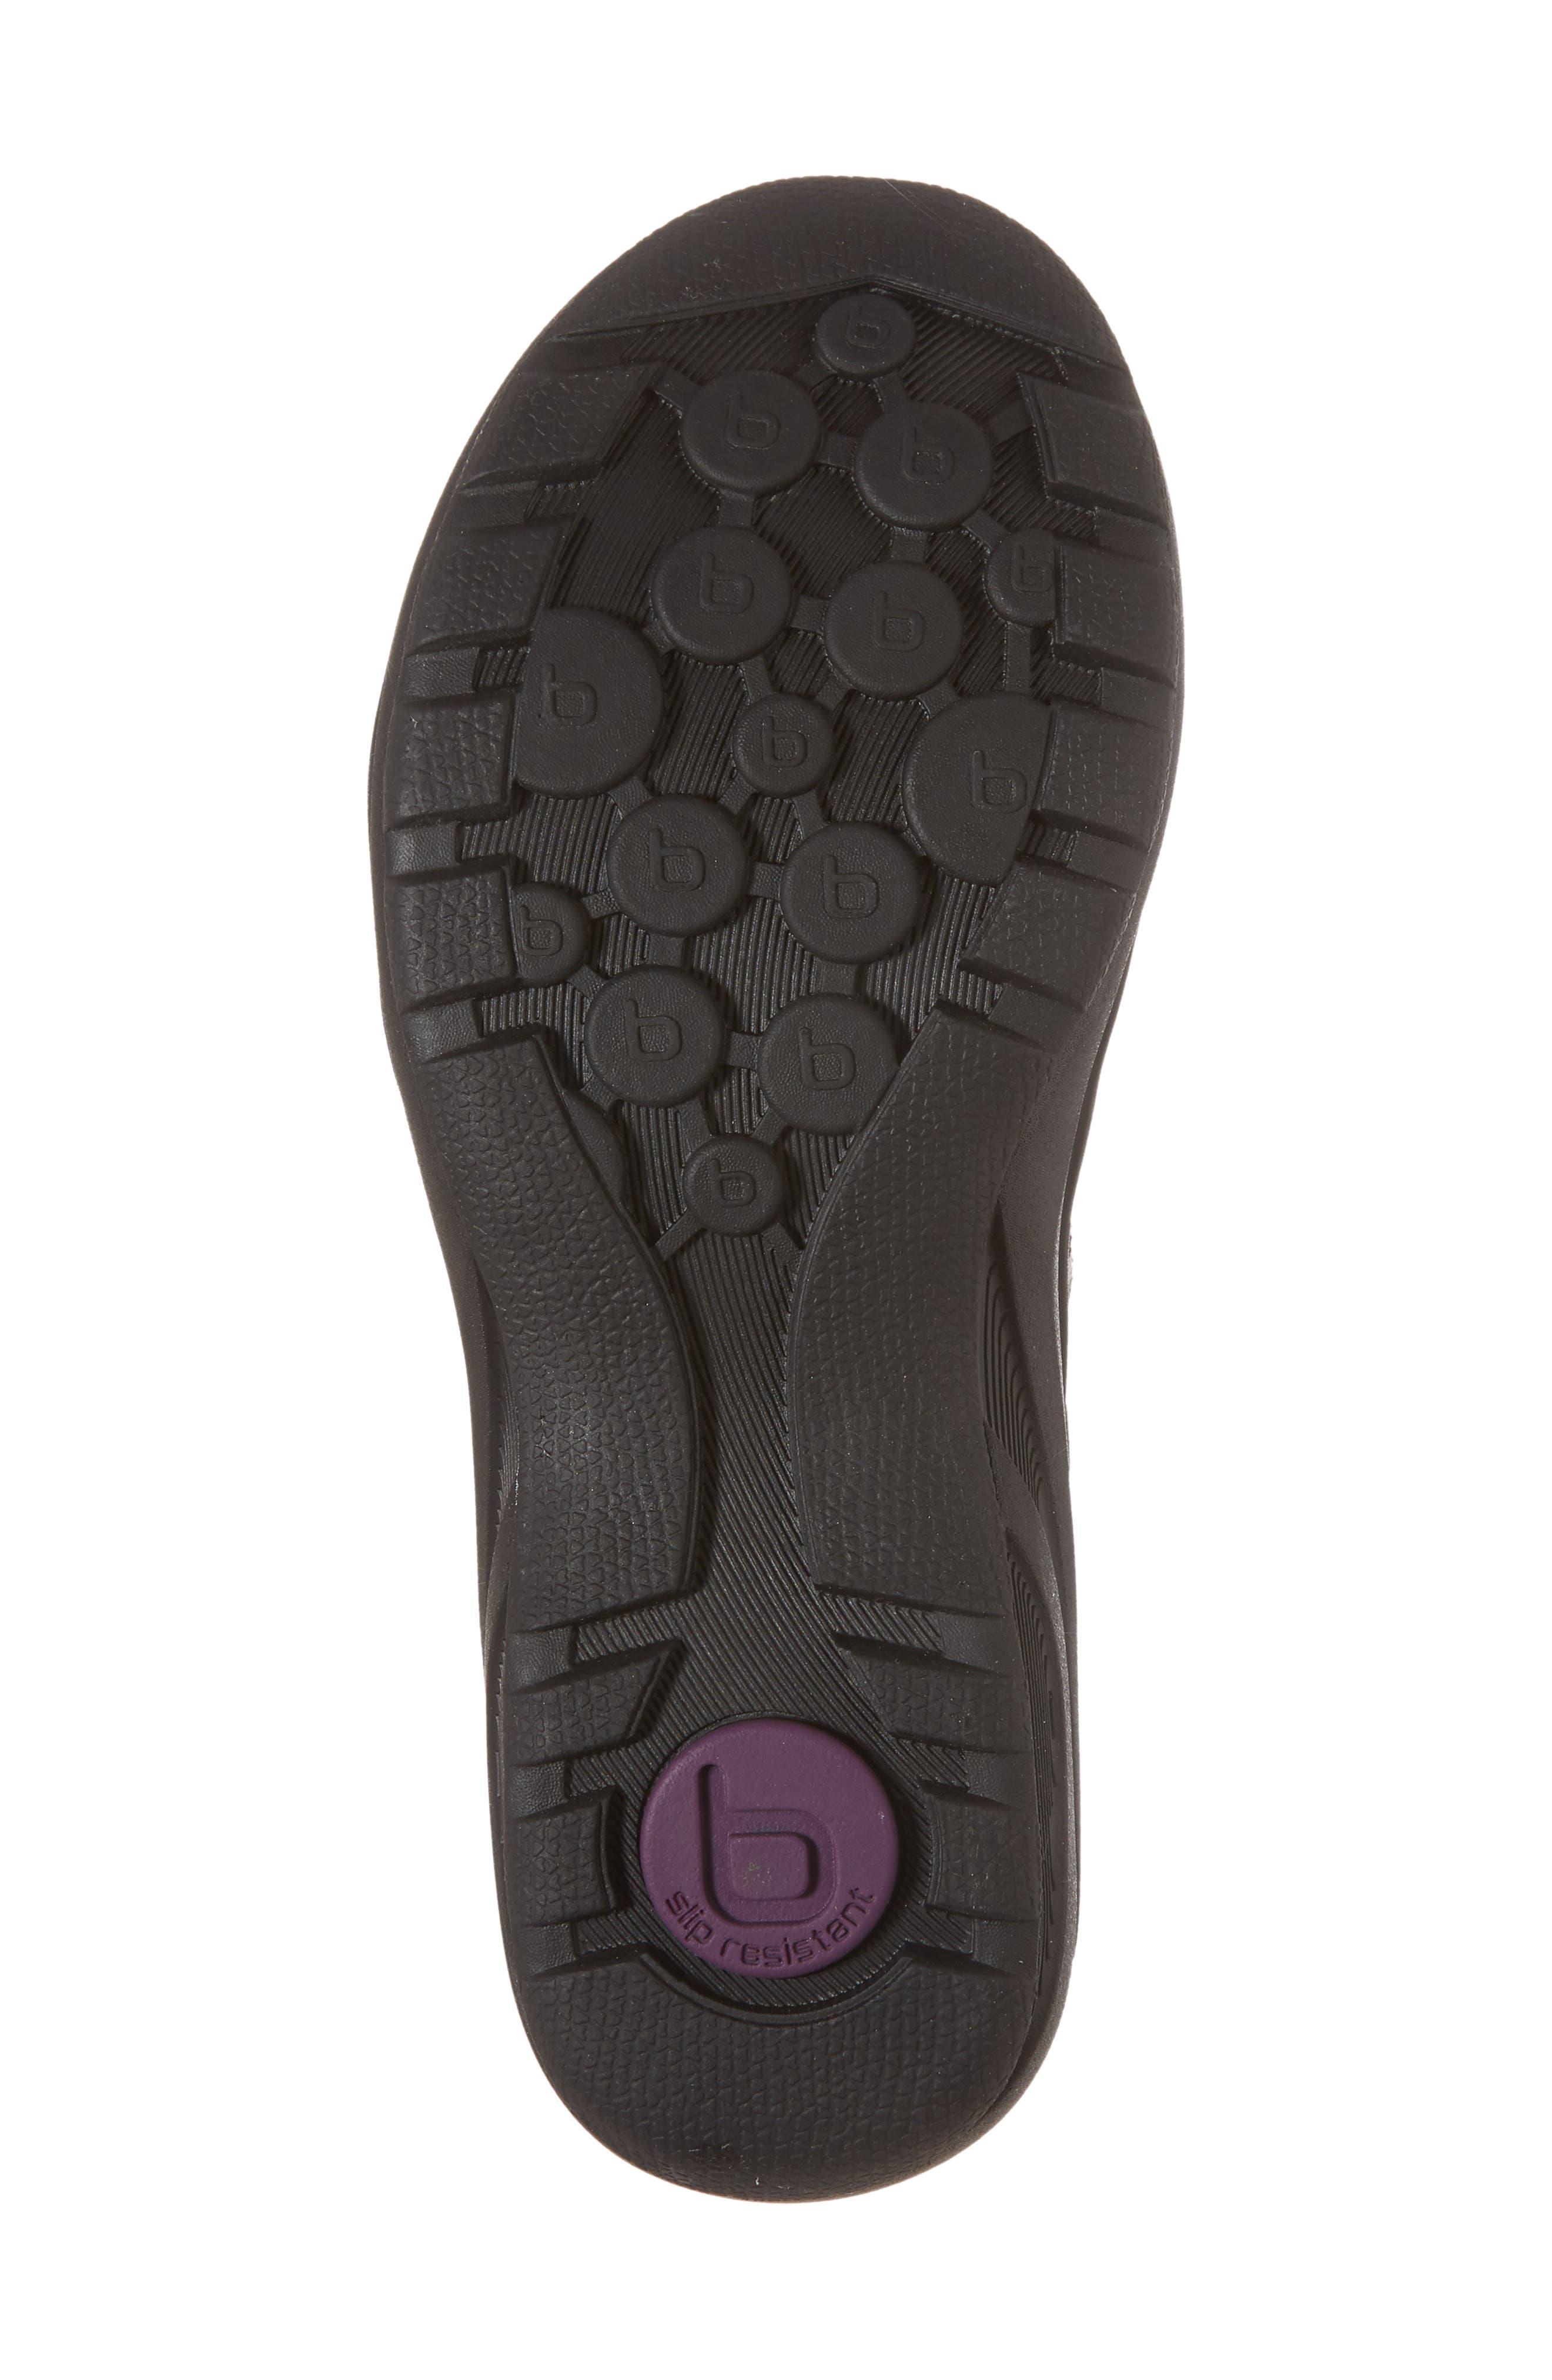 Malabar Sport Sandal,                             Alternate thumbnail 6, color,                             BLACK LEATHER